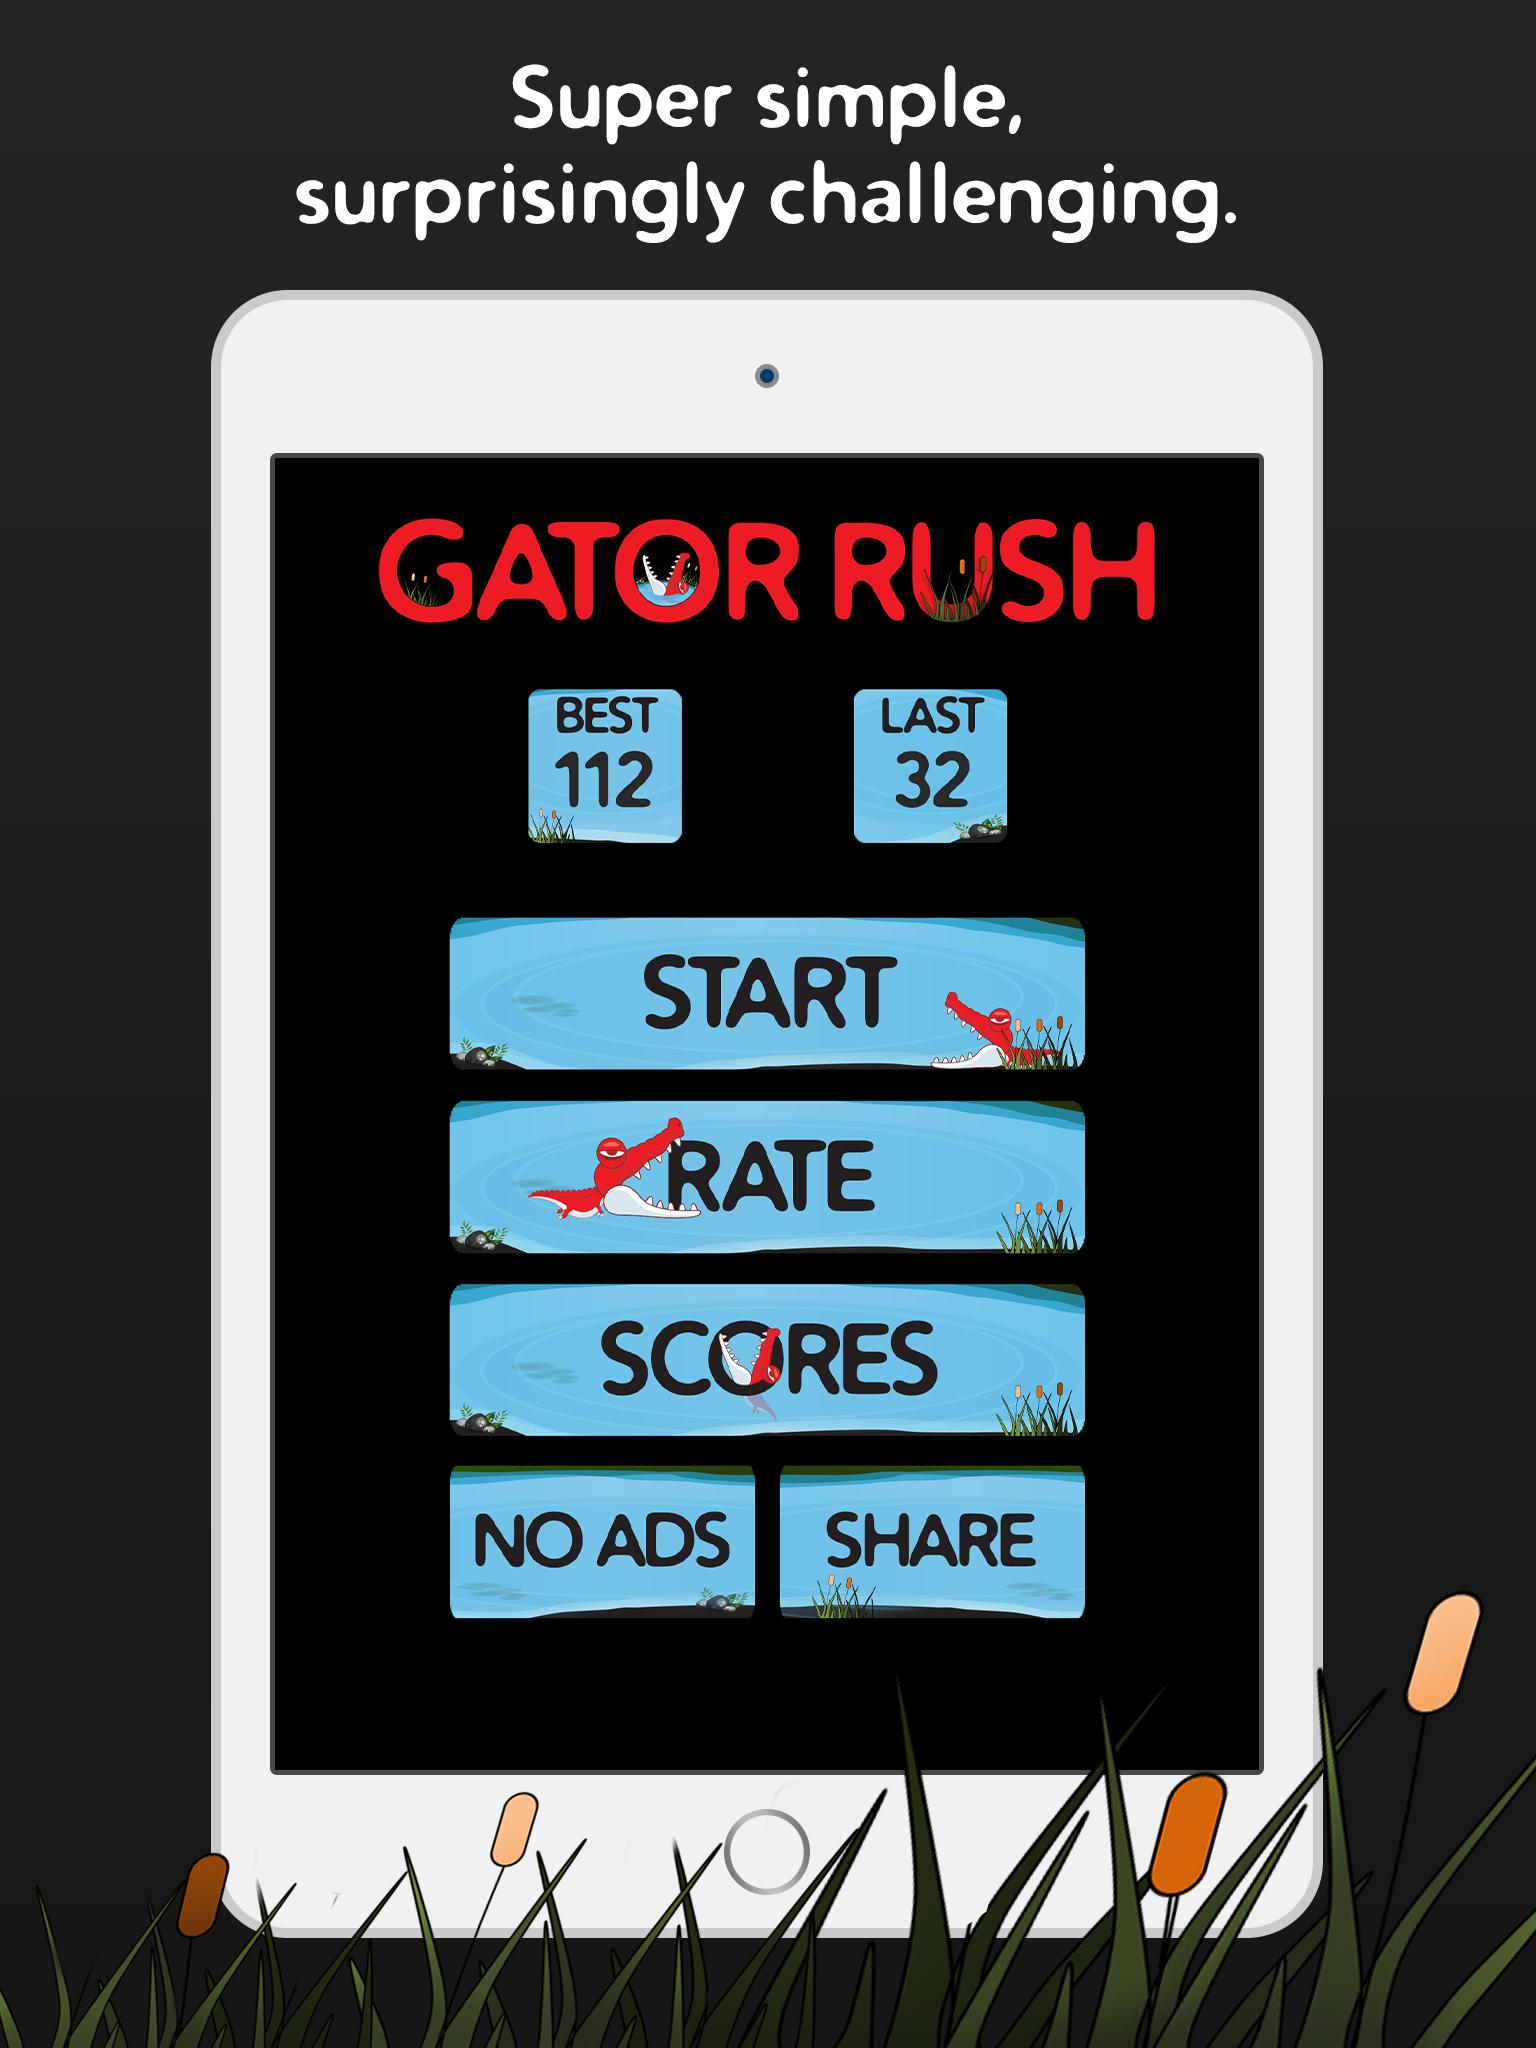 Gator_Rush_1.png